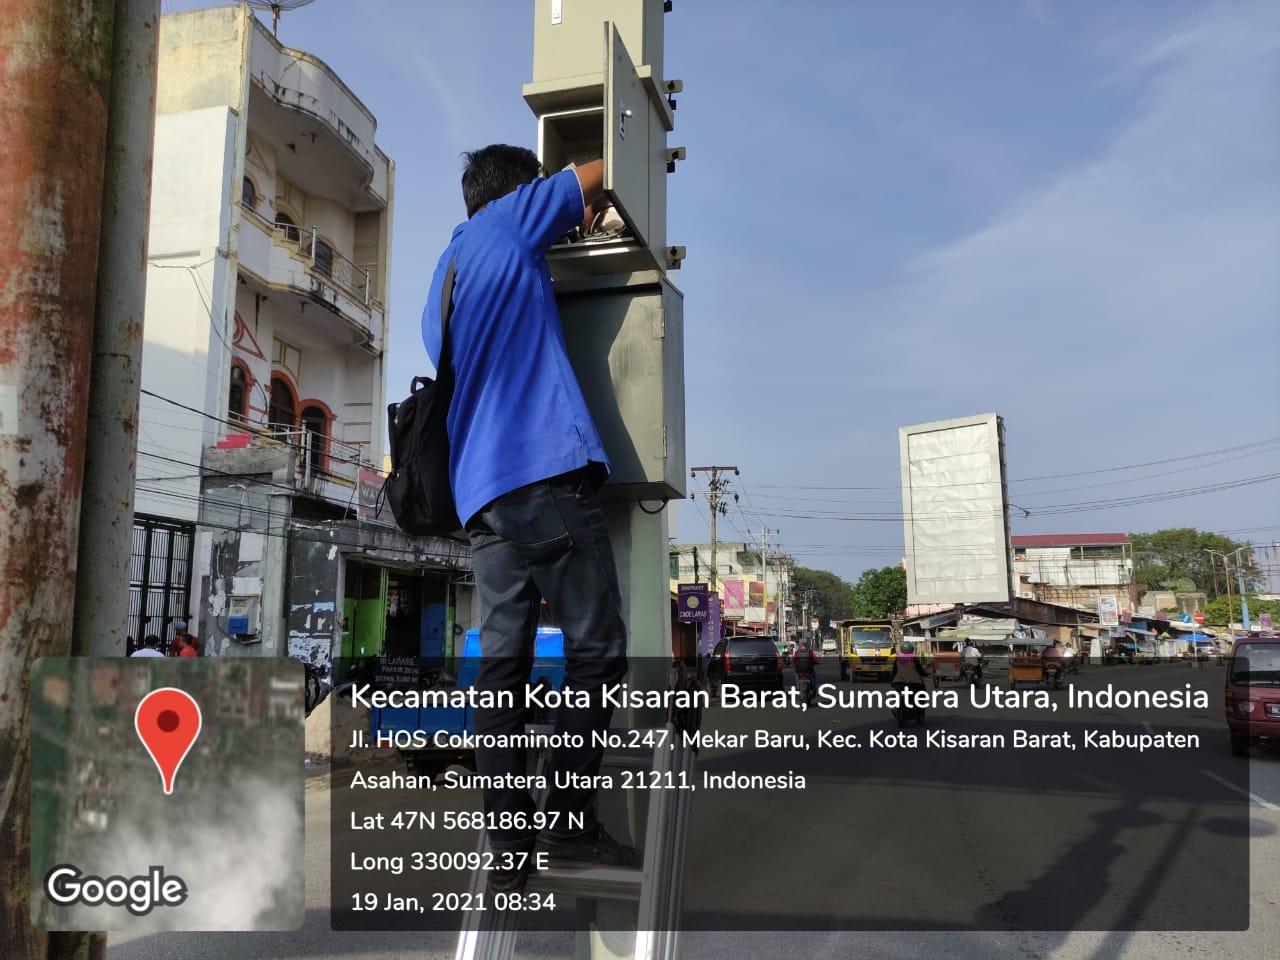 Perbaikan CCTV Titik Lokasi Jalan HOS Cokroaminoto Kecamatan Kota Kisaran Barat